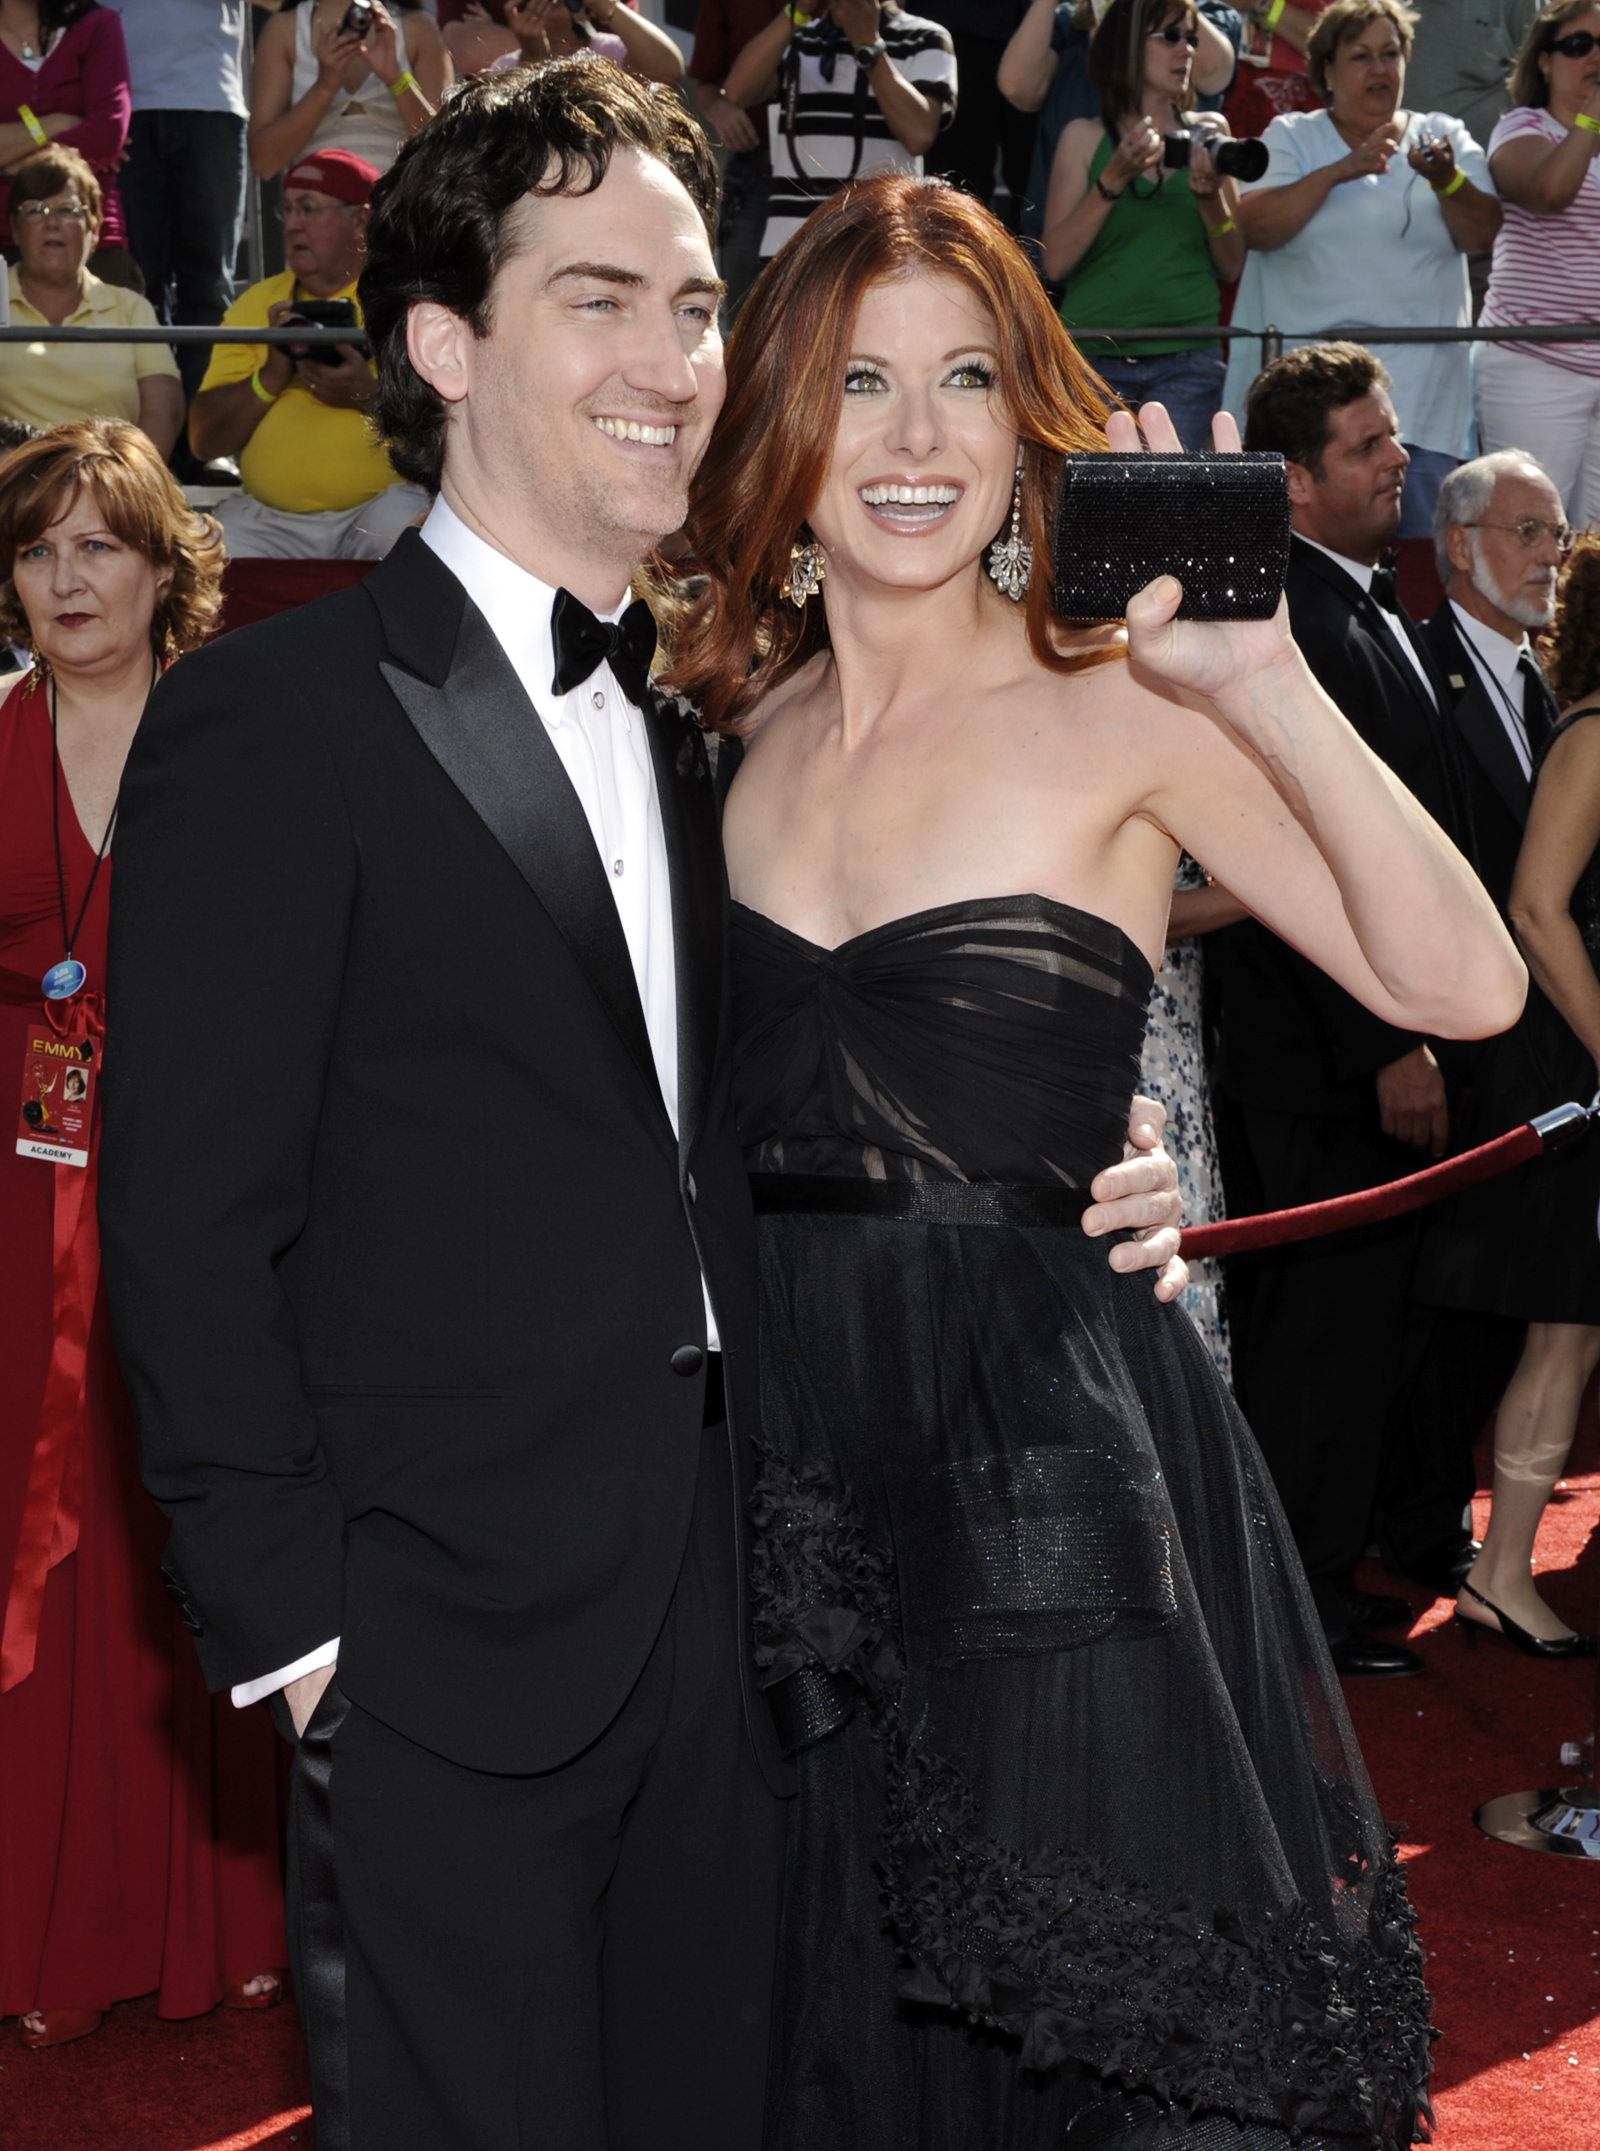 37121_Celebutopia-Debra_Messing_arrives_at_the_60th_Annual_Primetime_Emmy_Awards-02_122_1007lo.jpg